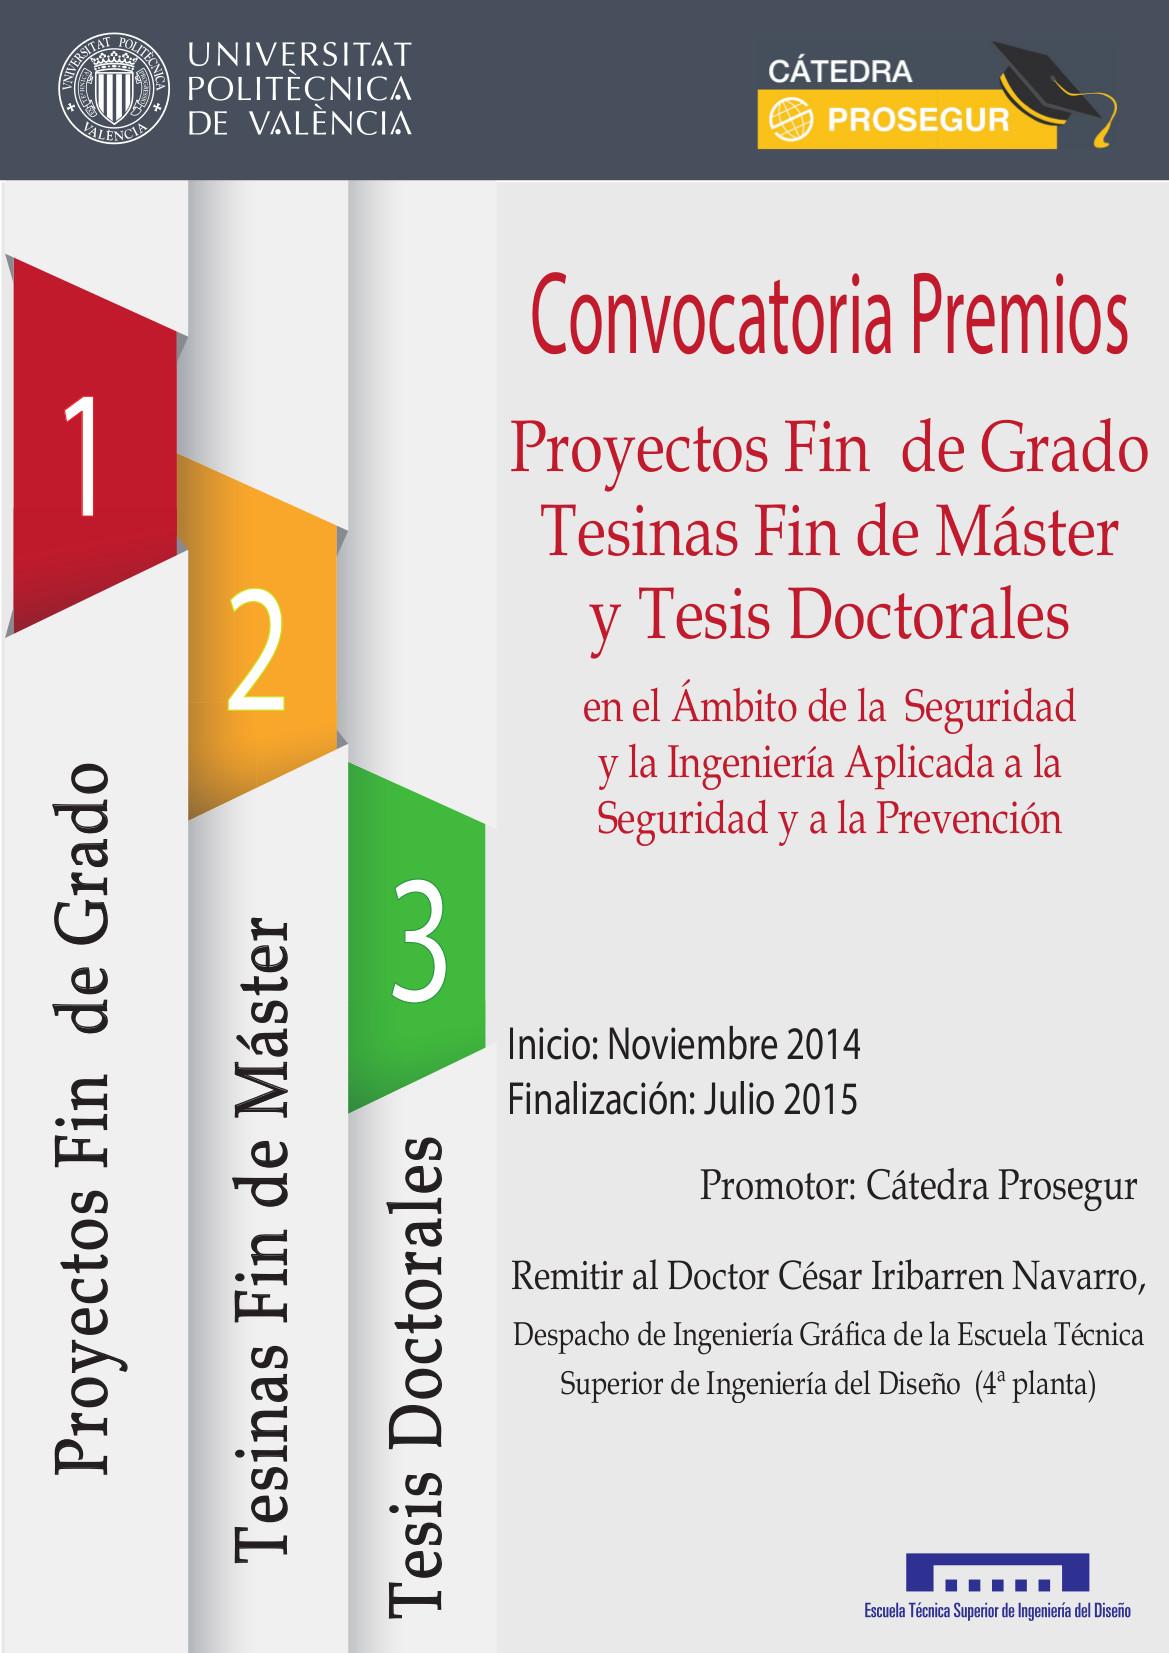 Cartel Convocatoria Premios 2014-15